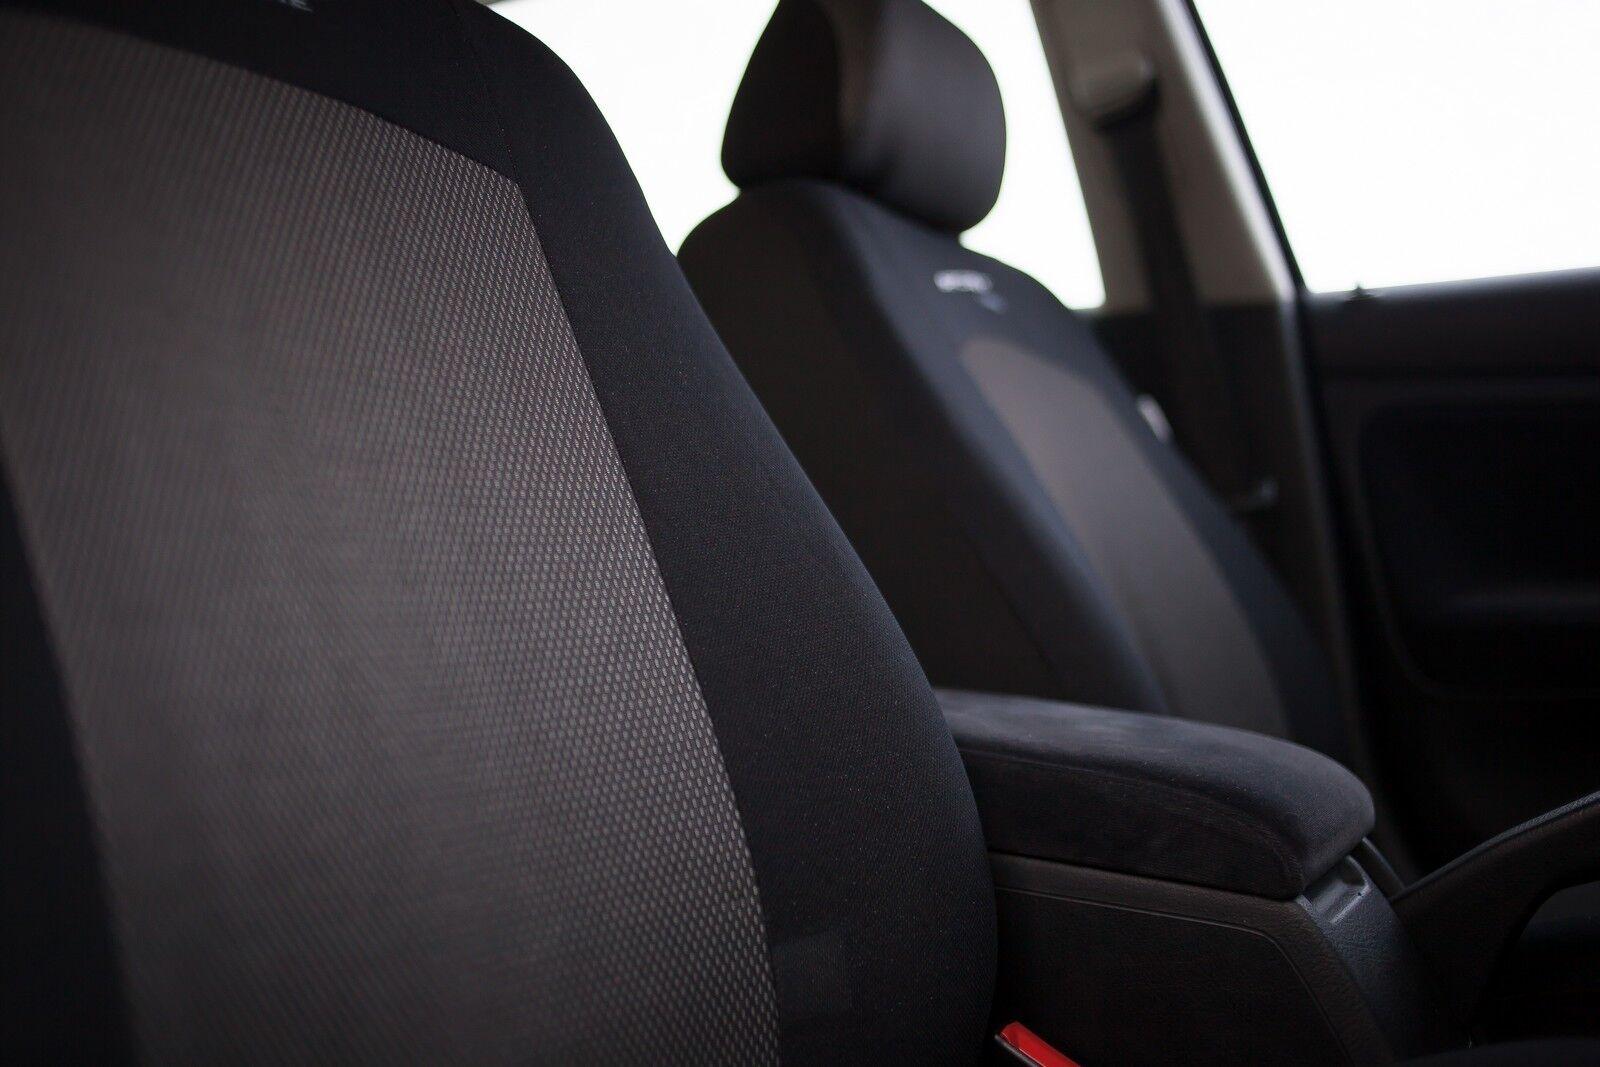 Sitzbezüge Sitzbezug Schonbezüge für Hyundai i30 Hellgrau Sportline Komplettset